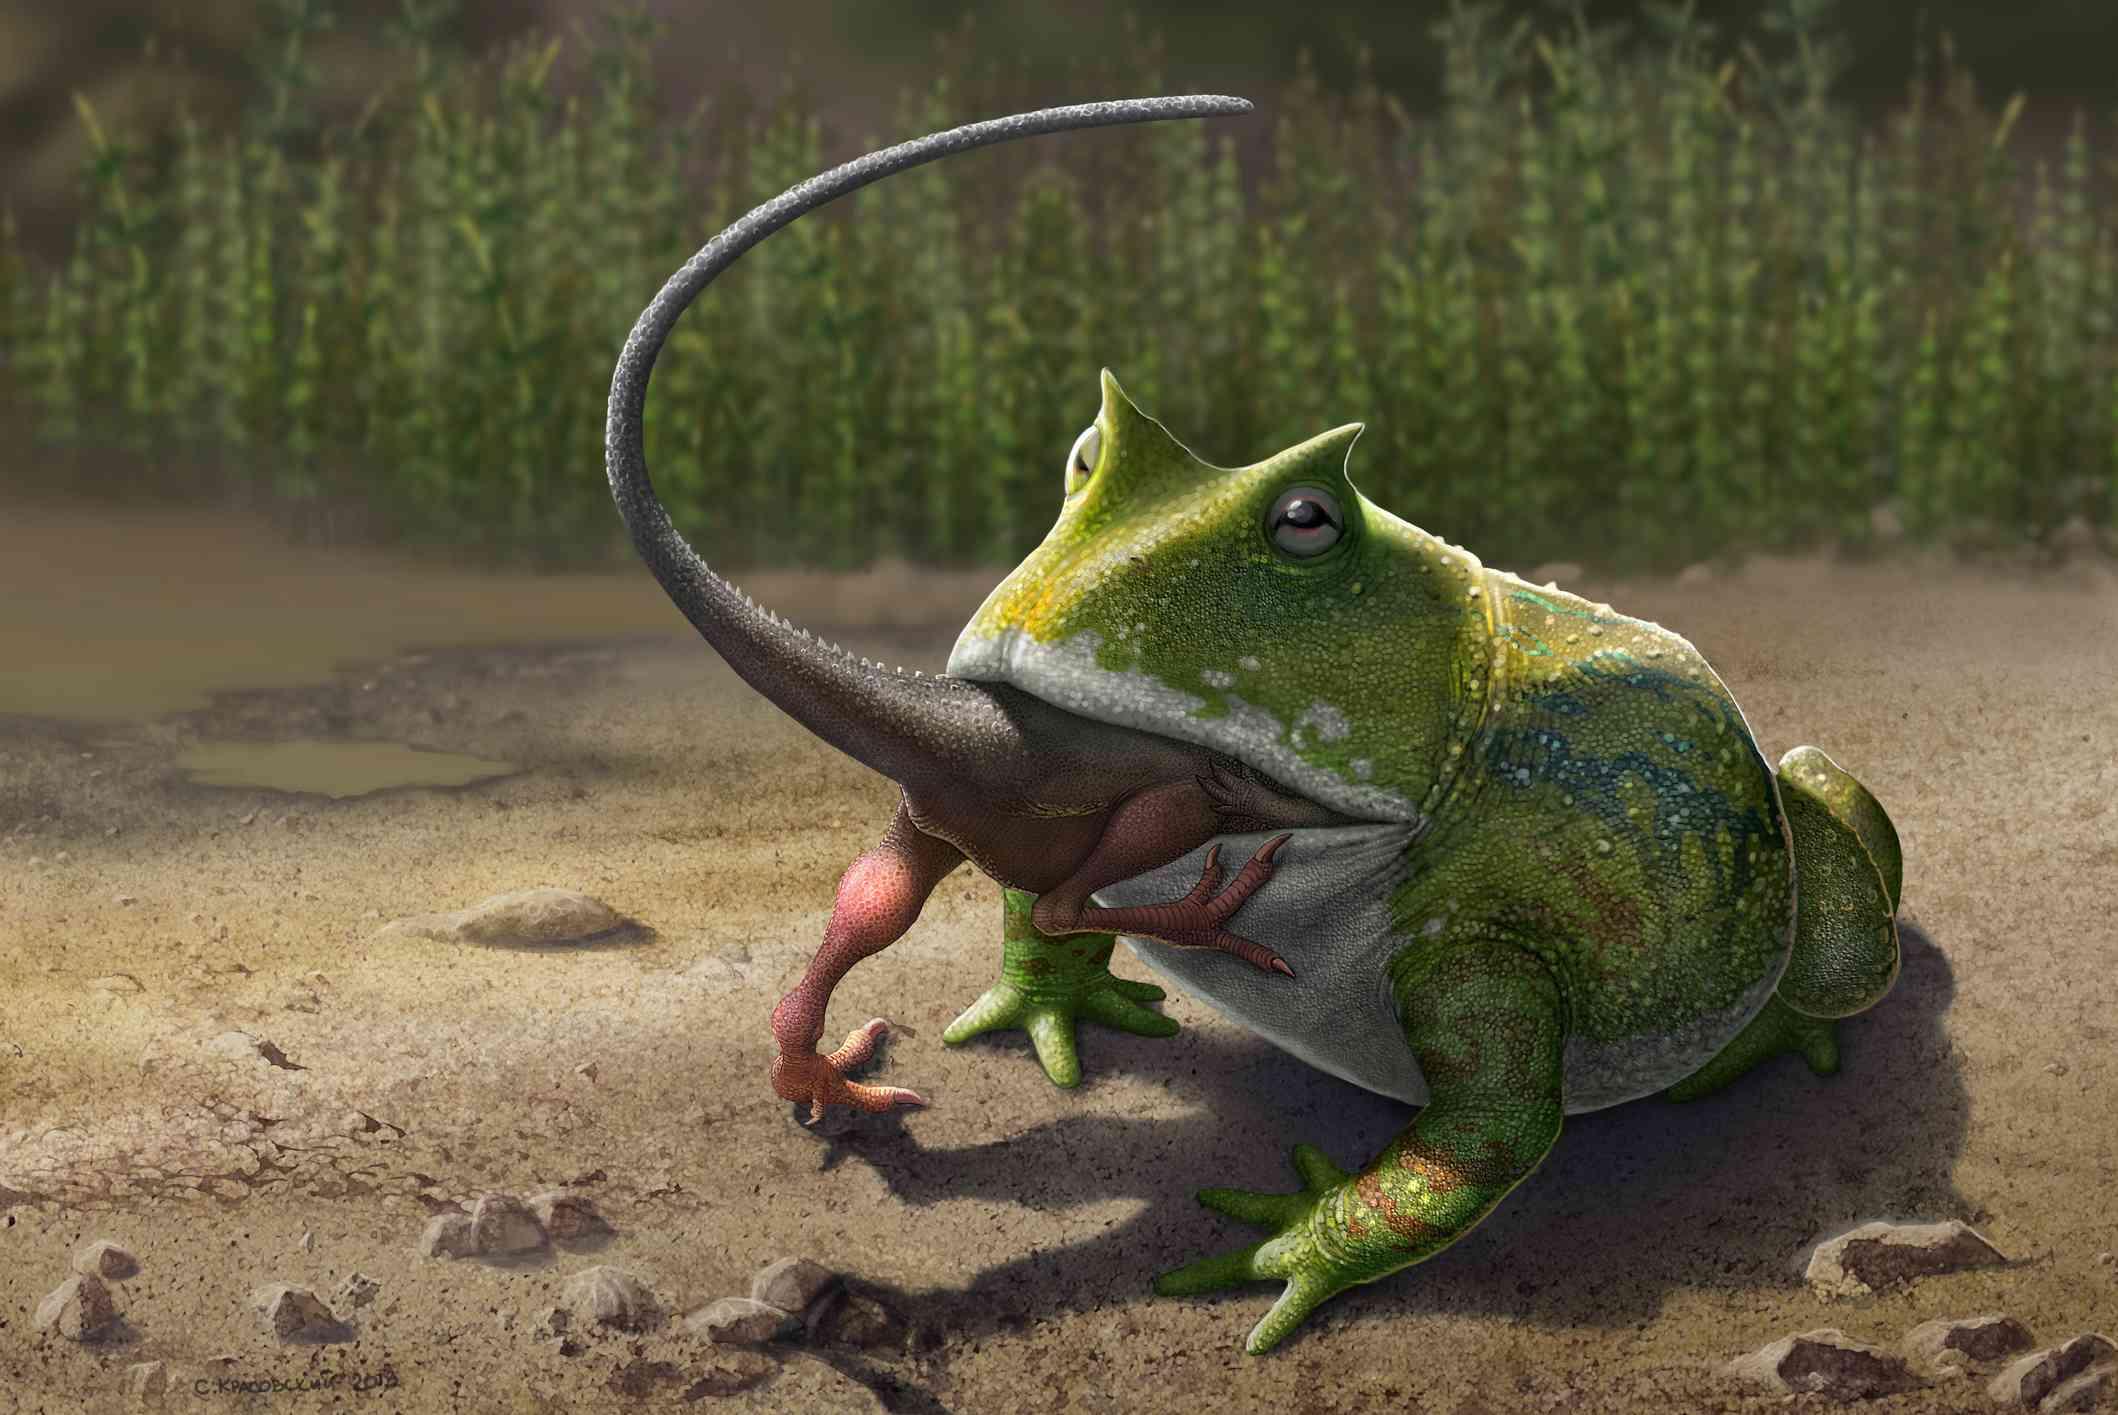 A large Beelzebufo ampinga frog